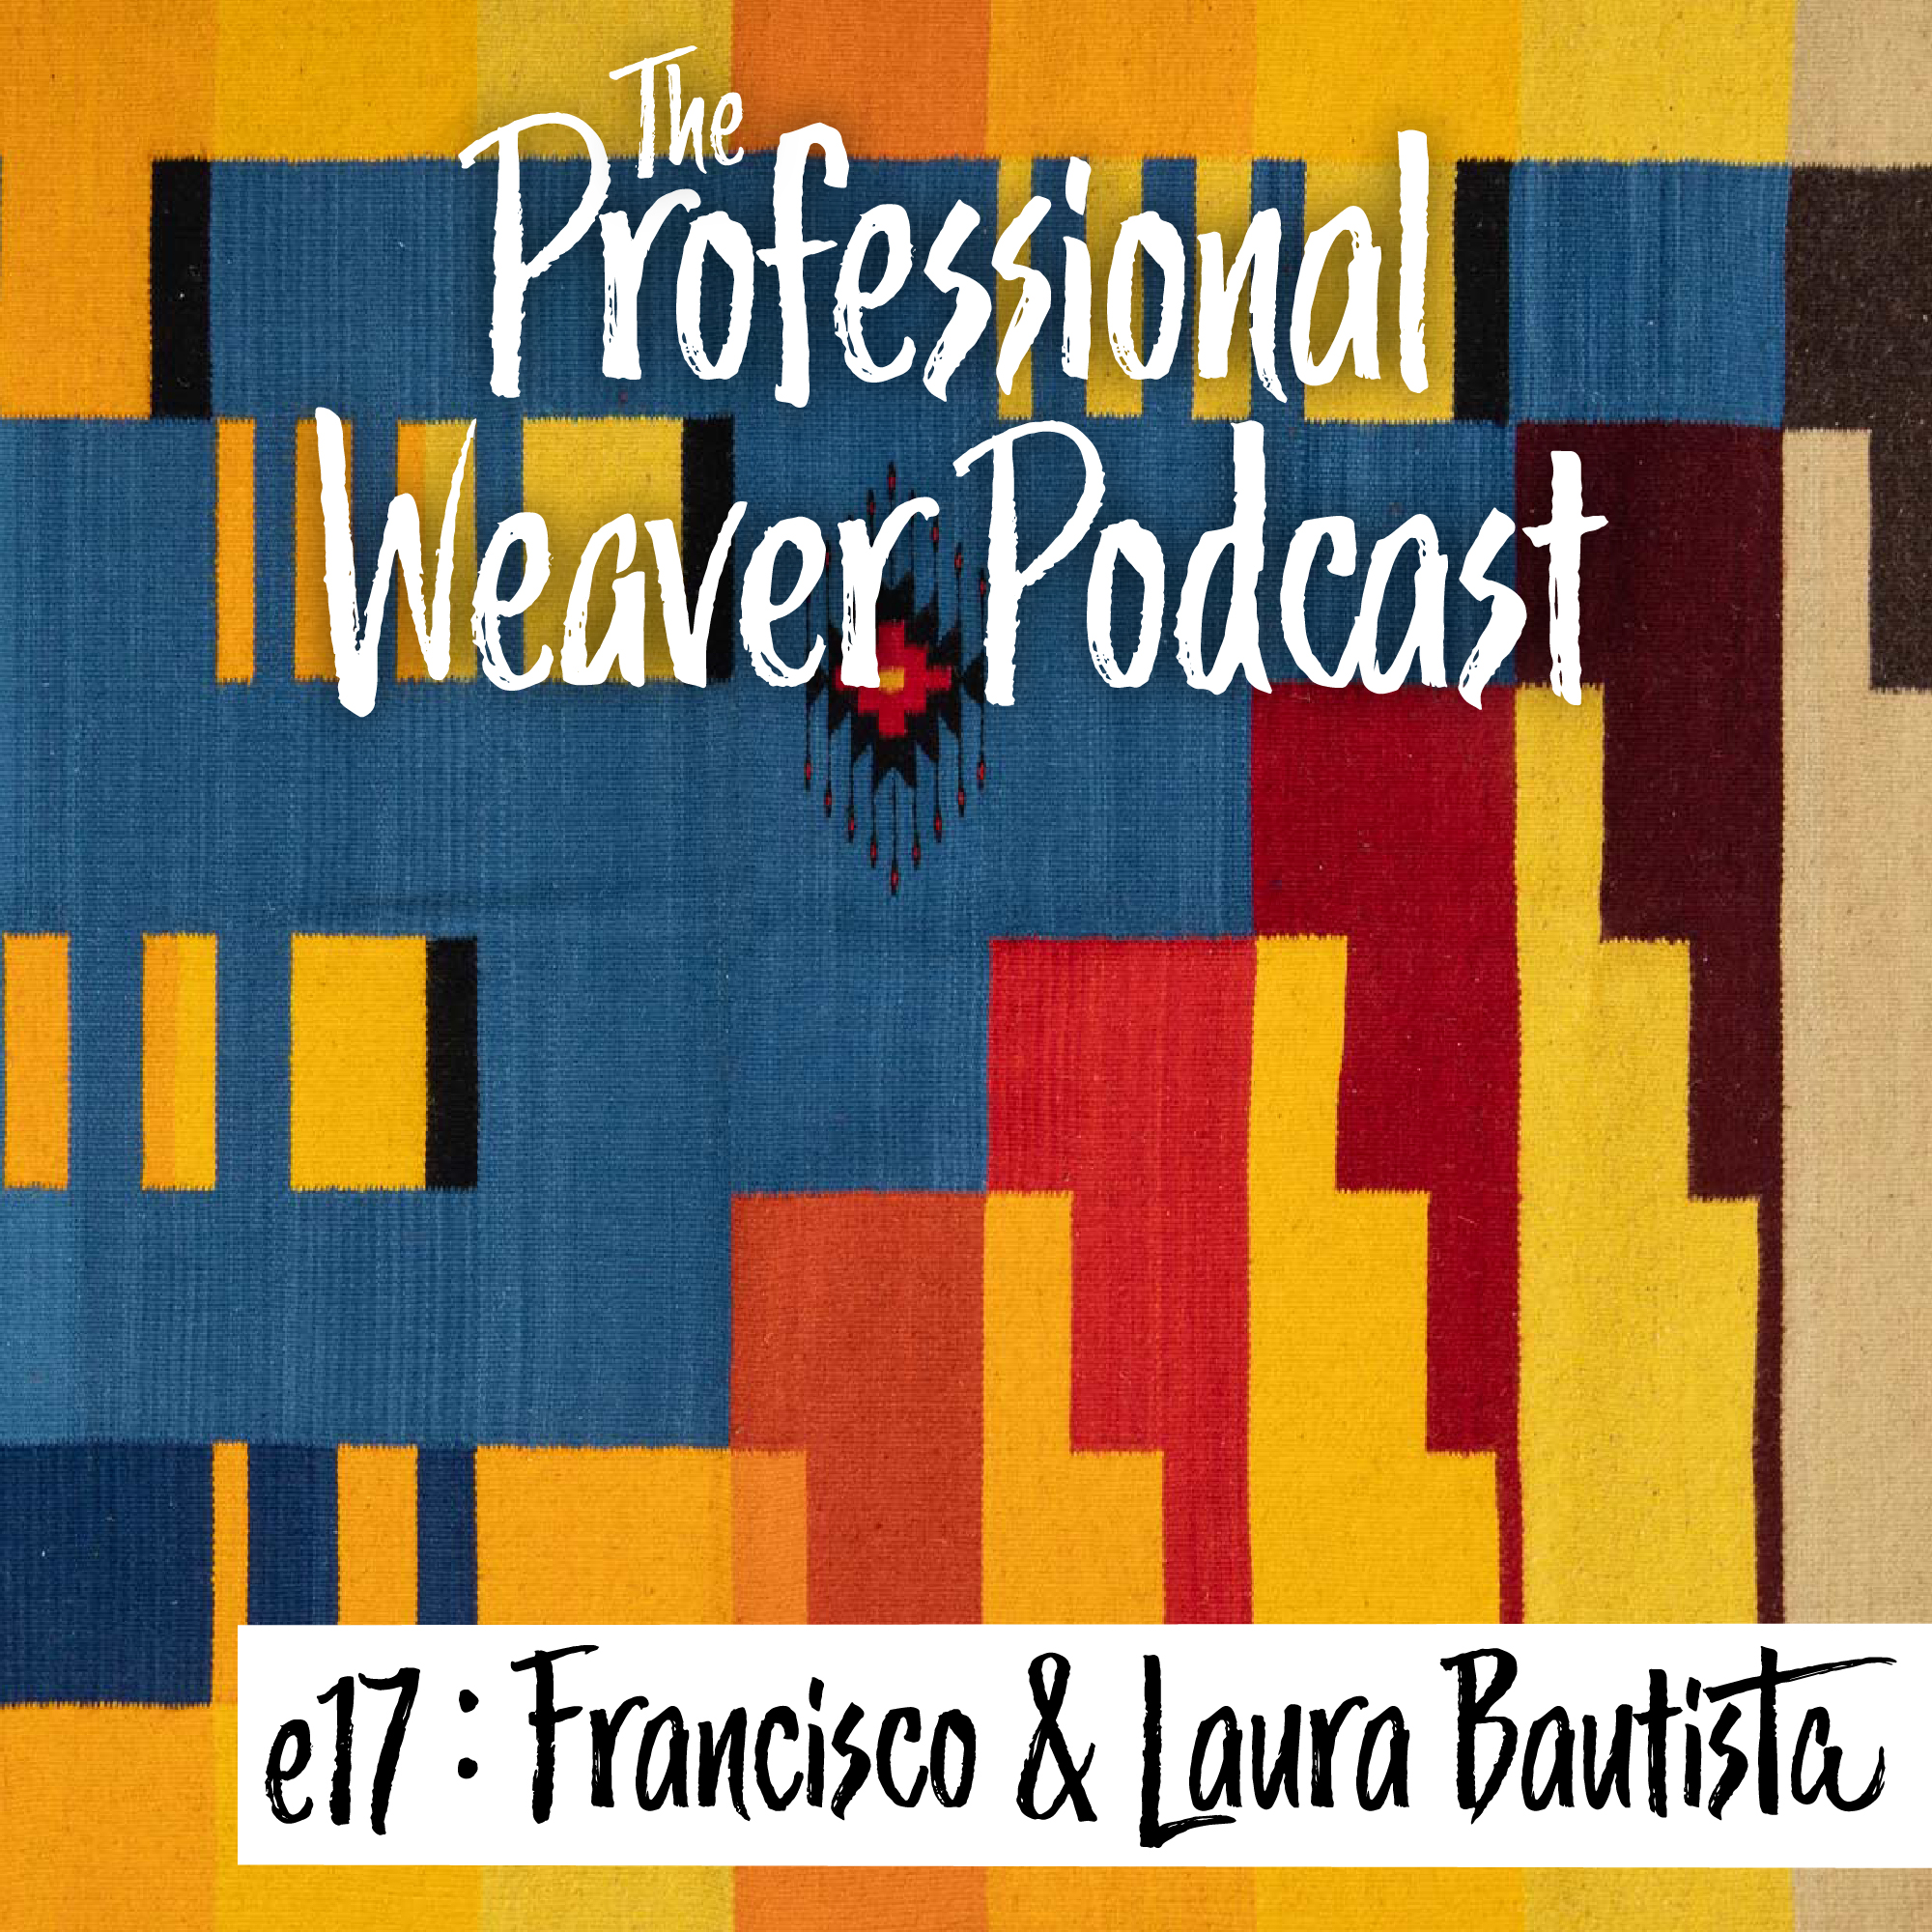 Pro Weaver Podcast : Episode 17 : Francisco & Laura Bautista